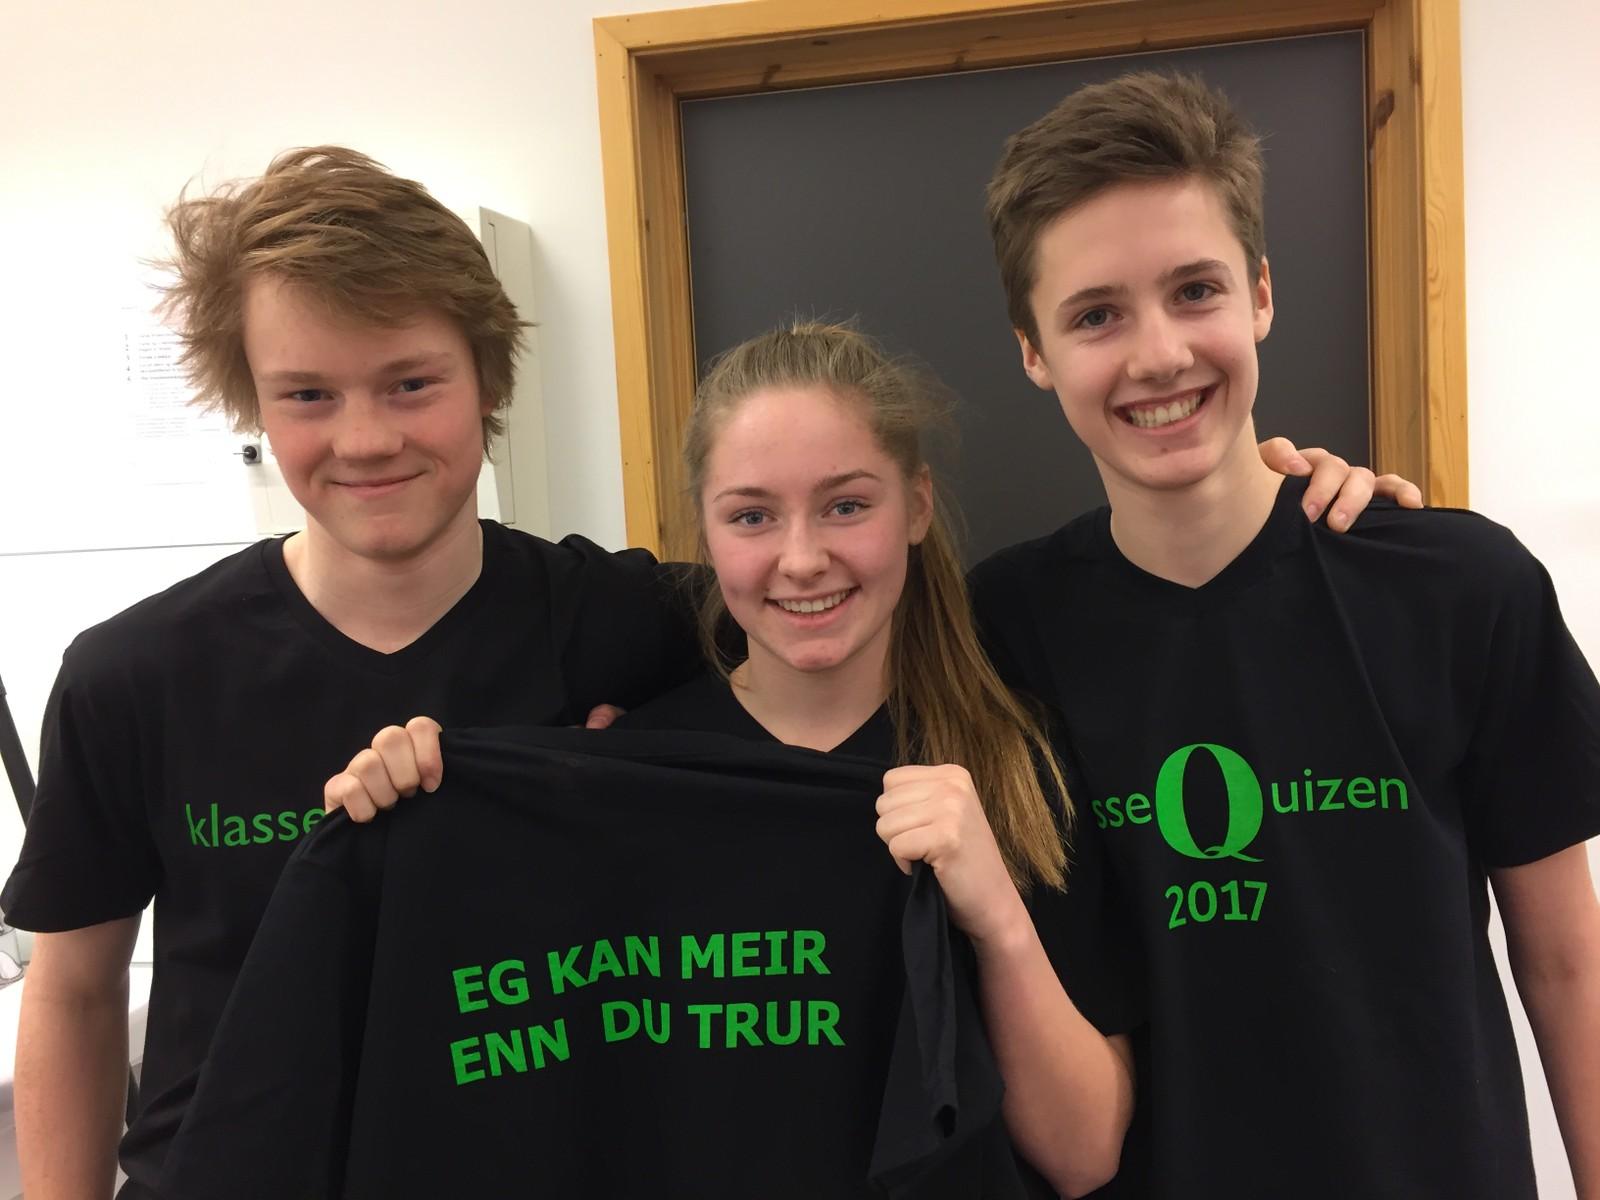 Edvin Jevnheim Bakkom, Julie Aanstad Rønningen og Paul Høsteng Haugen fra Skjåk ungdomsskule fikk sju poeng.